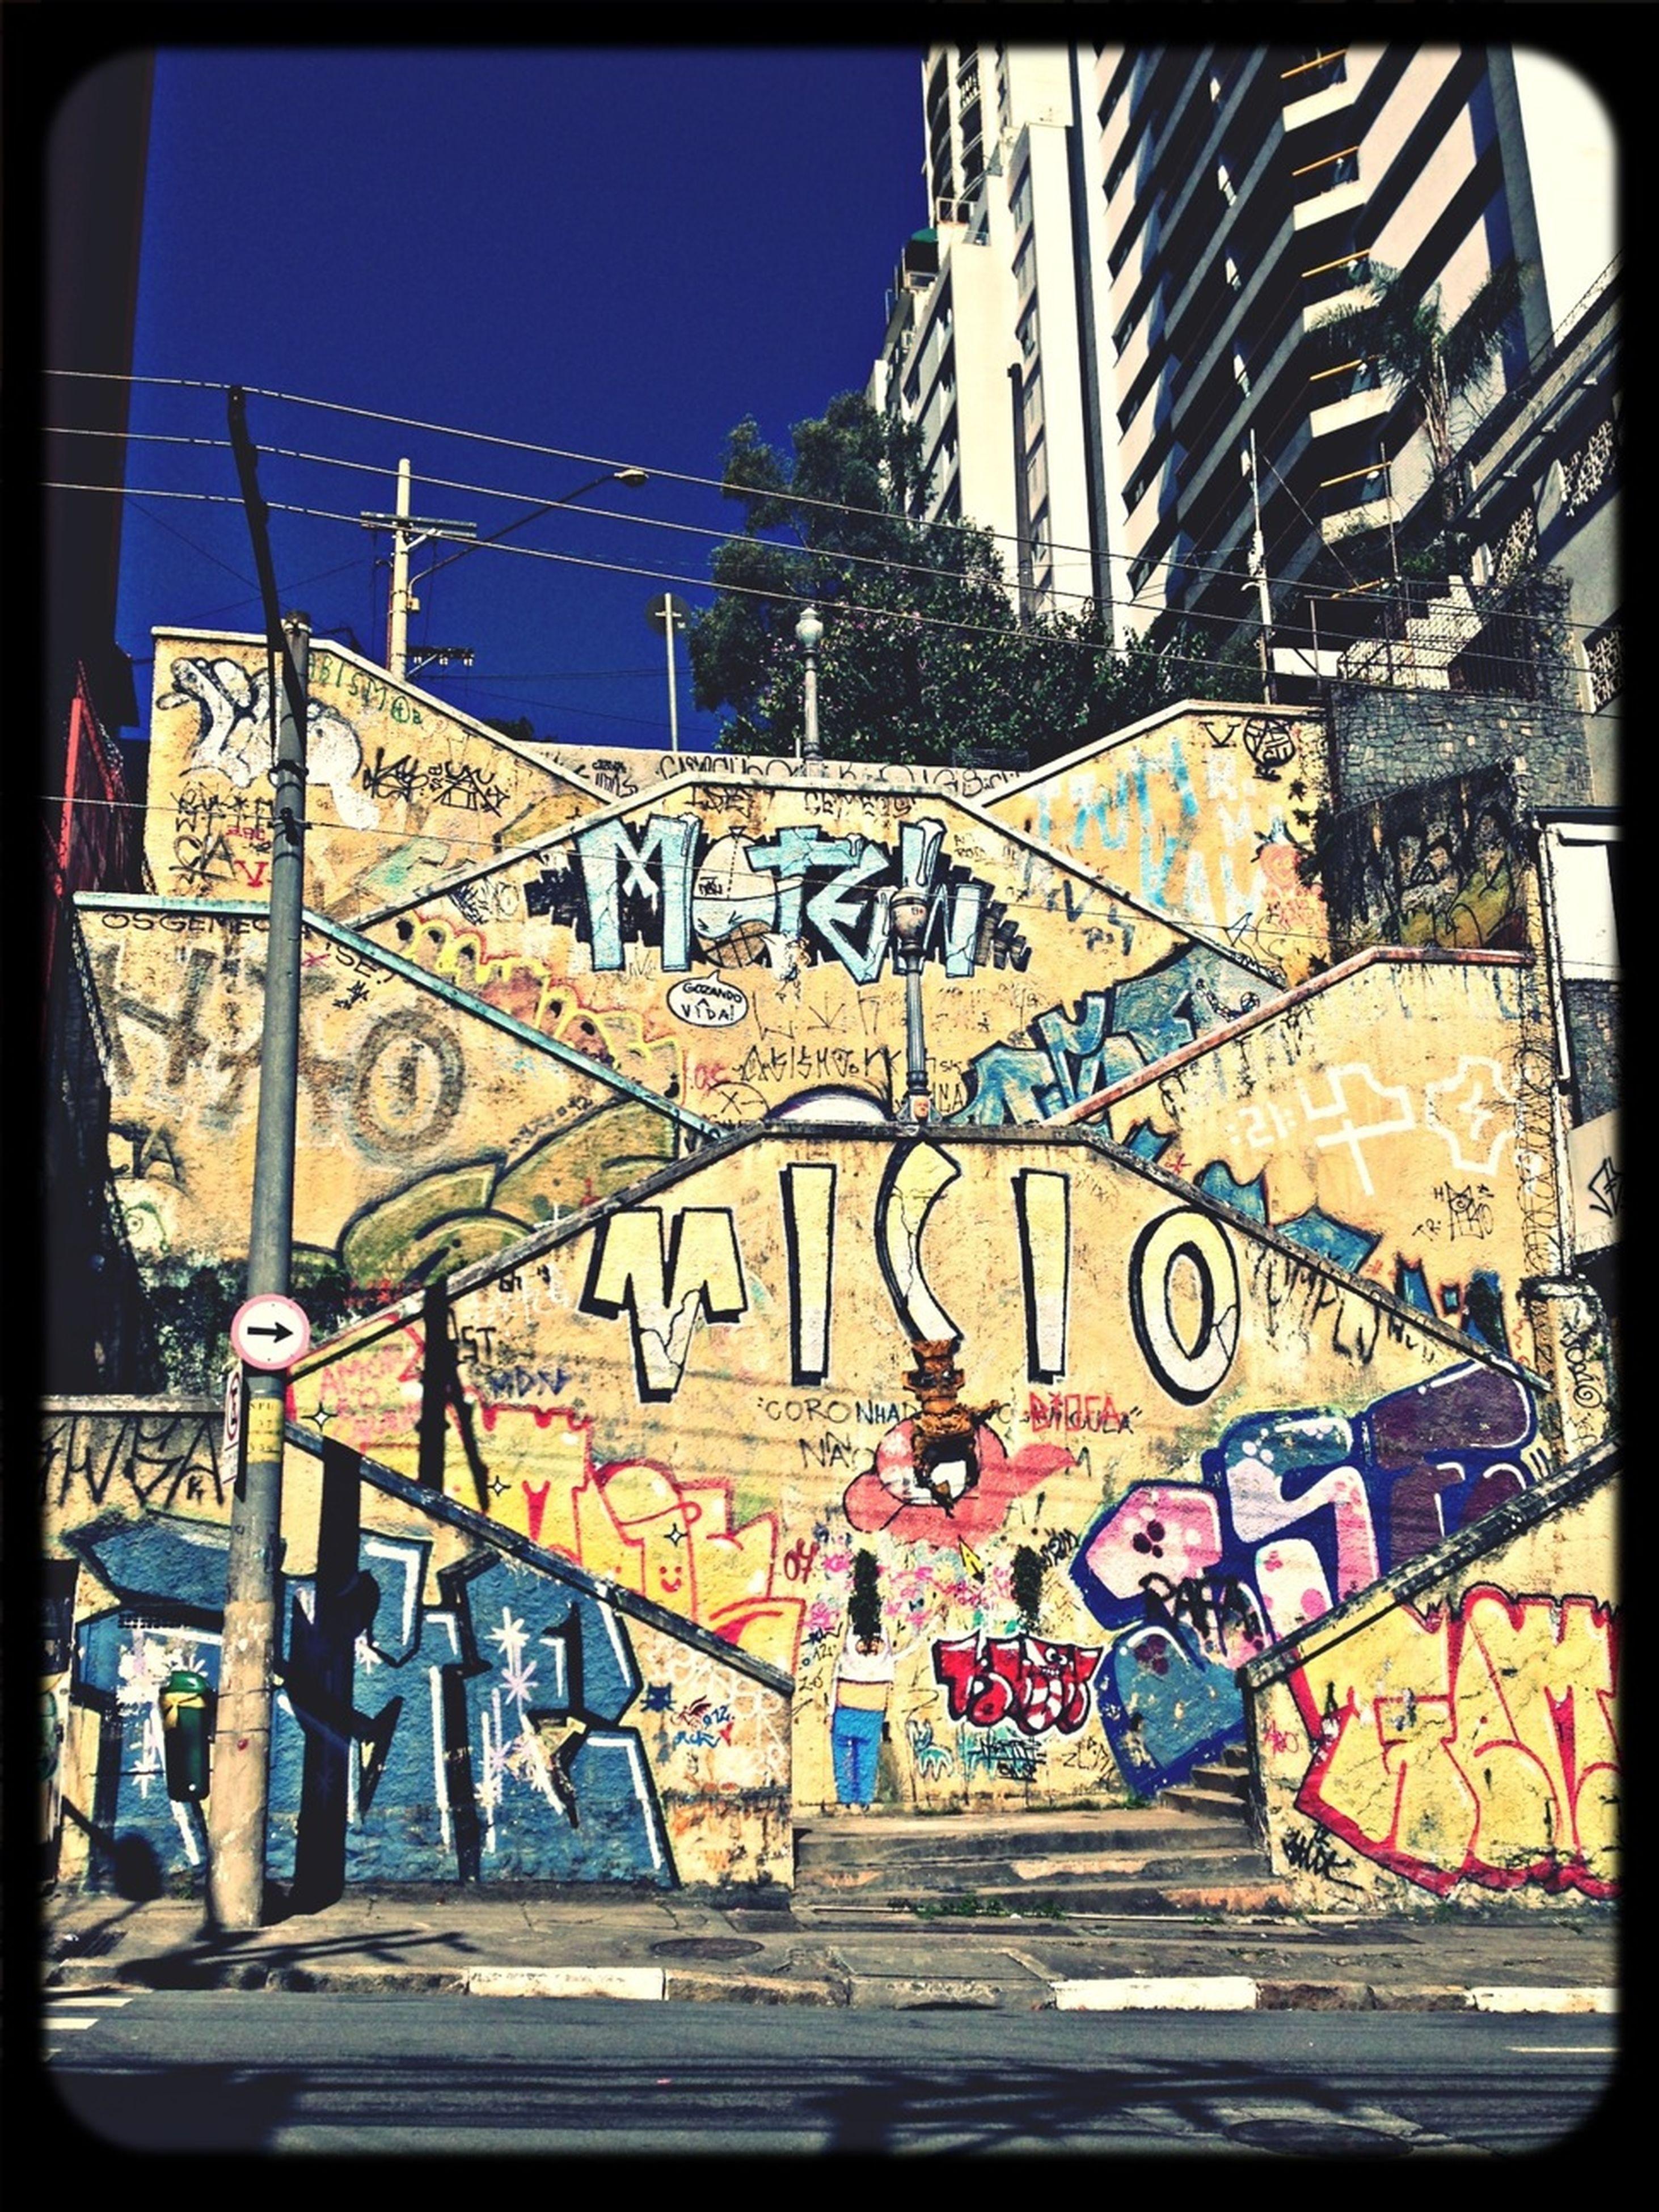 graffiti, built structure, architecture, building exterior, text, transfer print, western script, art, auto post production filter, creativity, art and craft, communication, wall - building feature, street art, city, vandalism, building, outdoors, day, sunlight